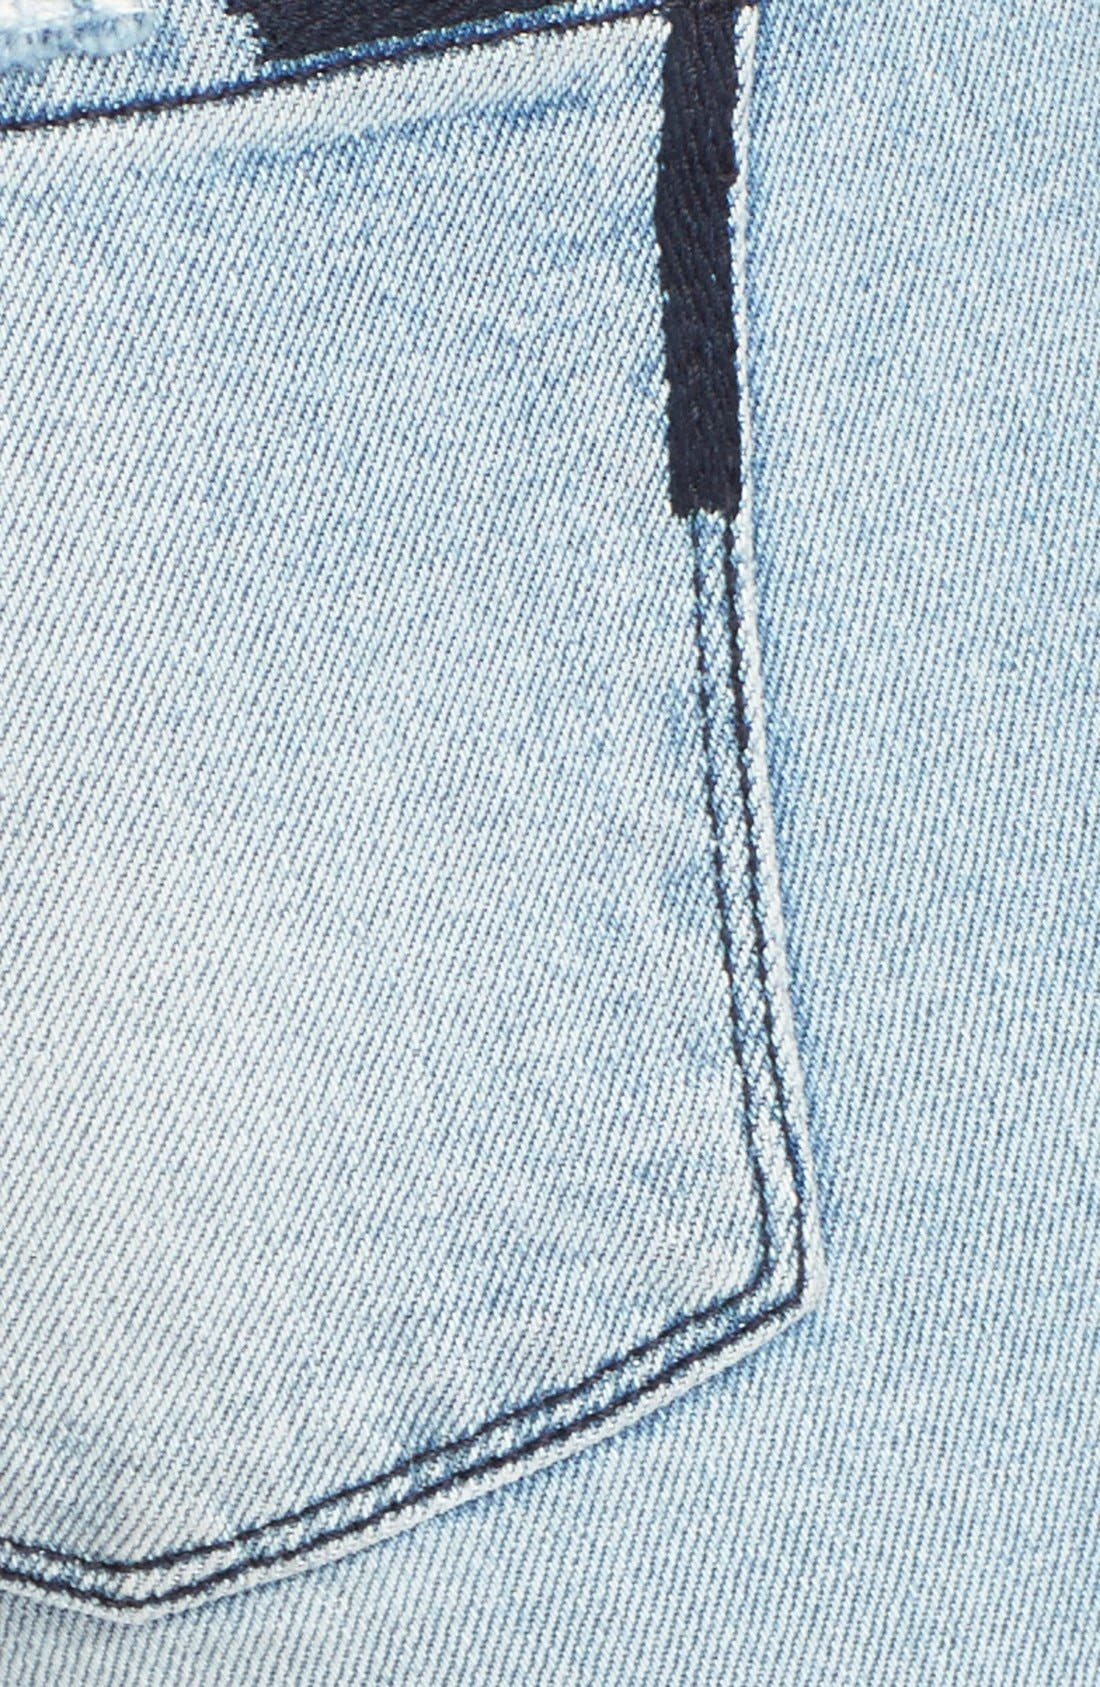 'Icon' Destroyed Skinny Jeans,                             Alternate thumbnail 3, color,                             Whiplash